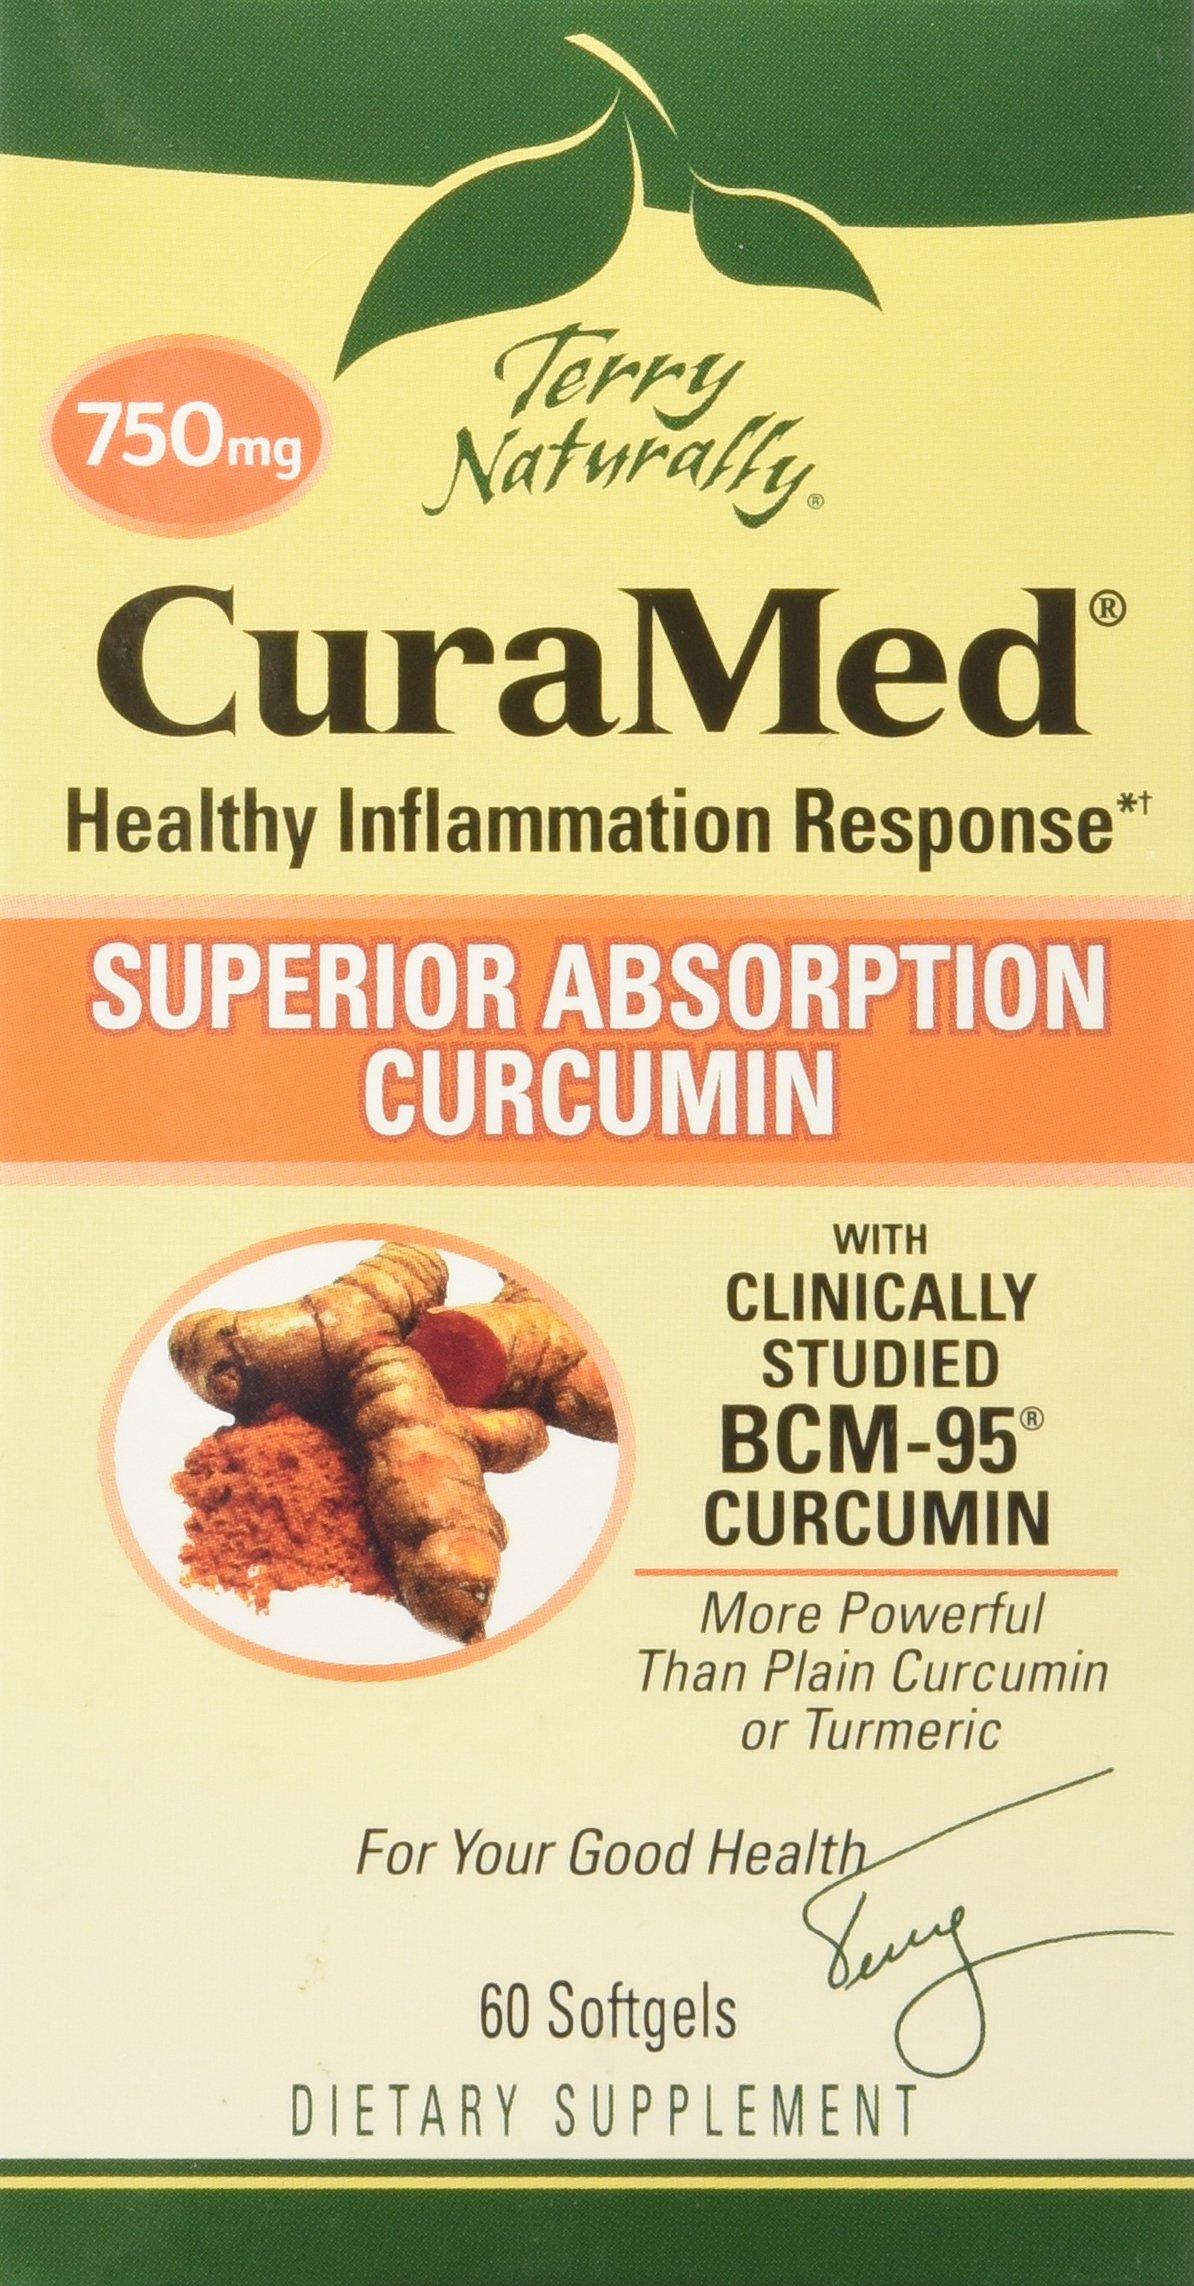 Curamed 750mg (60 SoftGelCaps) Curcumin Turmeric Brand: Terry Naturally